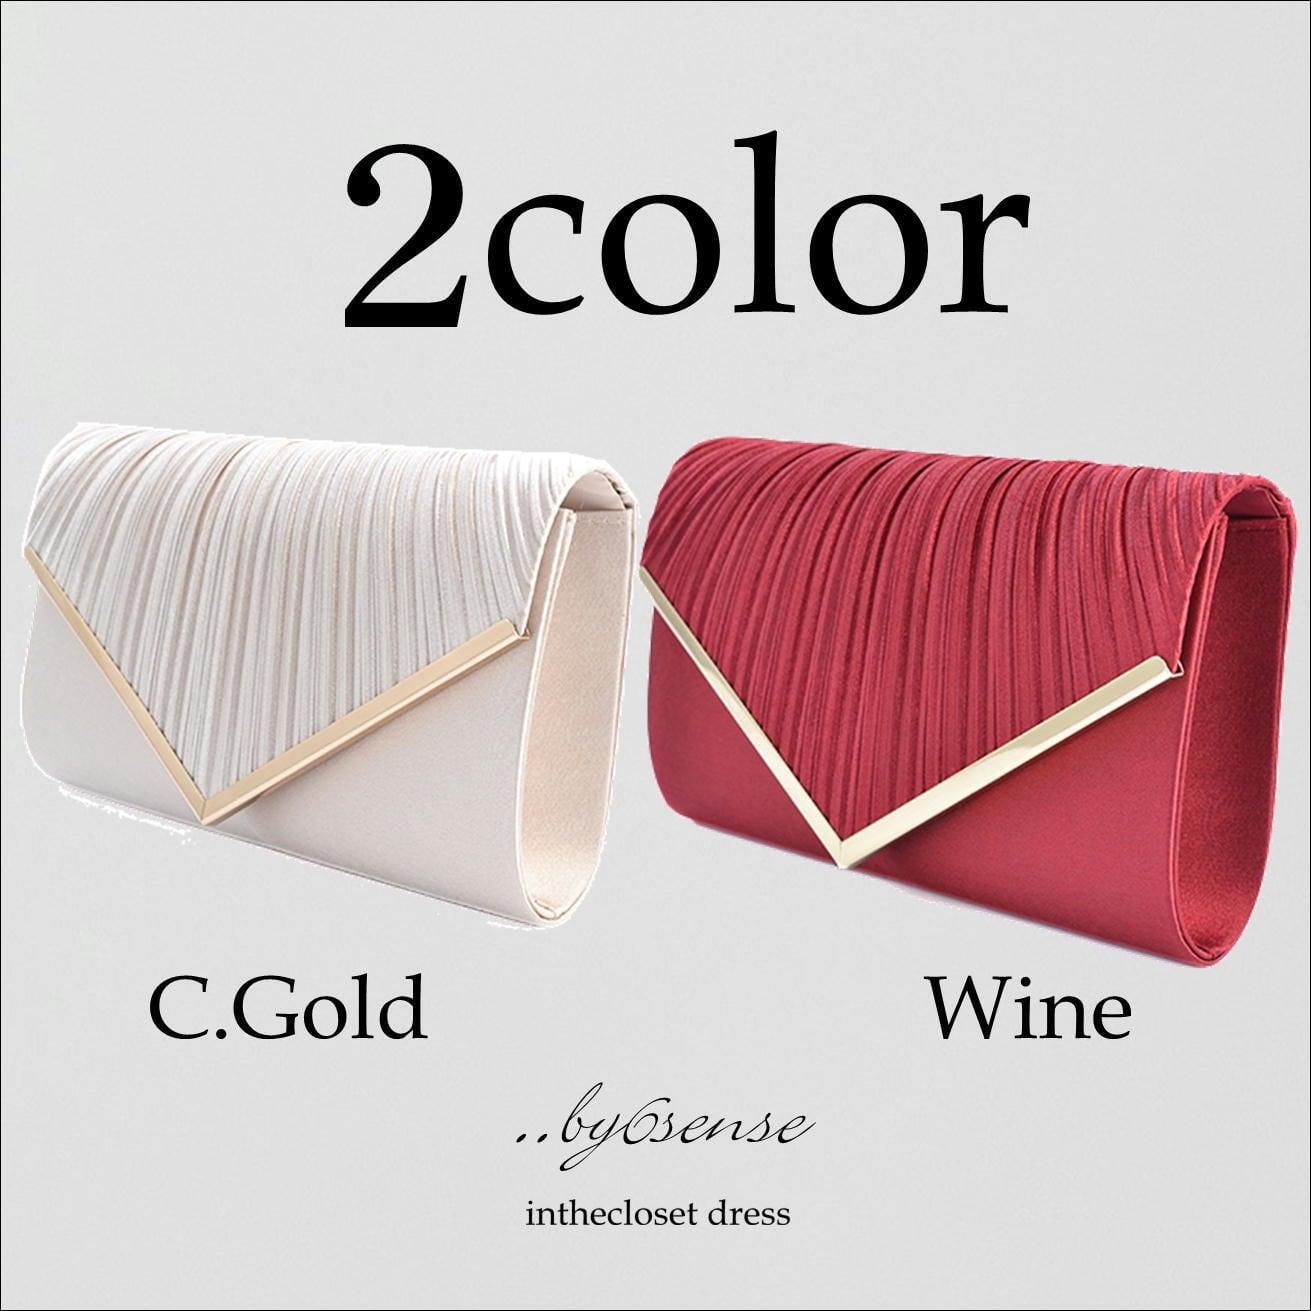 2color パーティーバック0405-6【結婚式・二次会・謝恩会・パーティーバック】